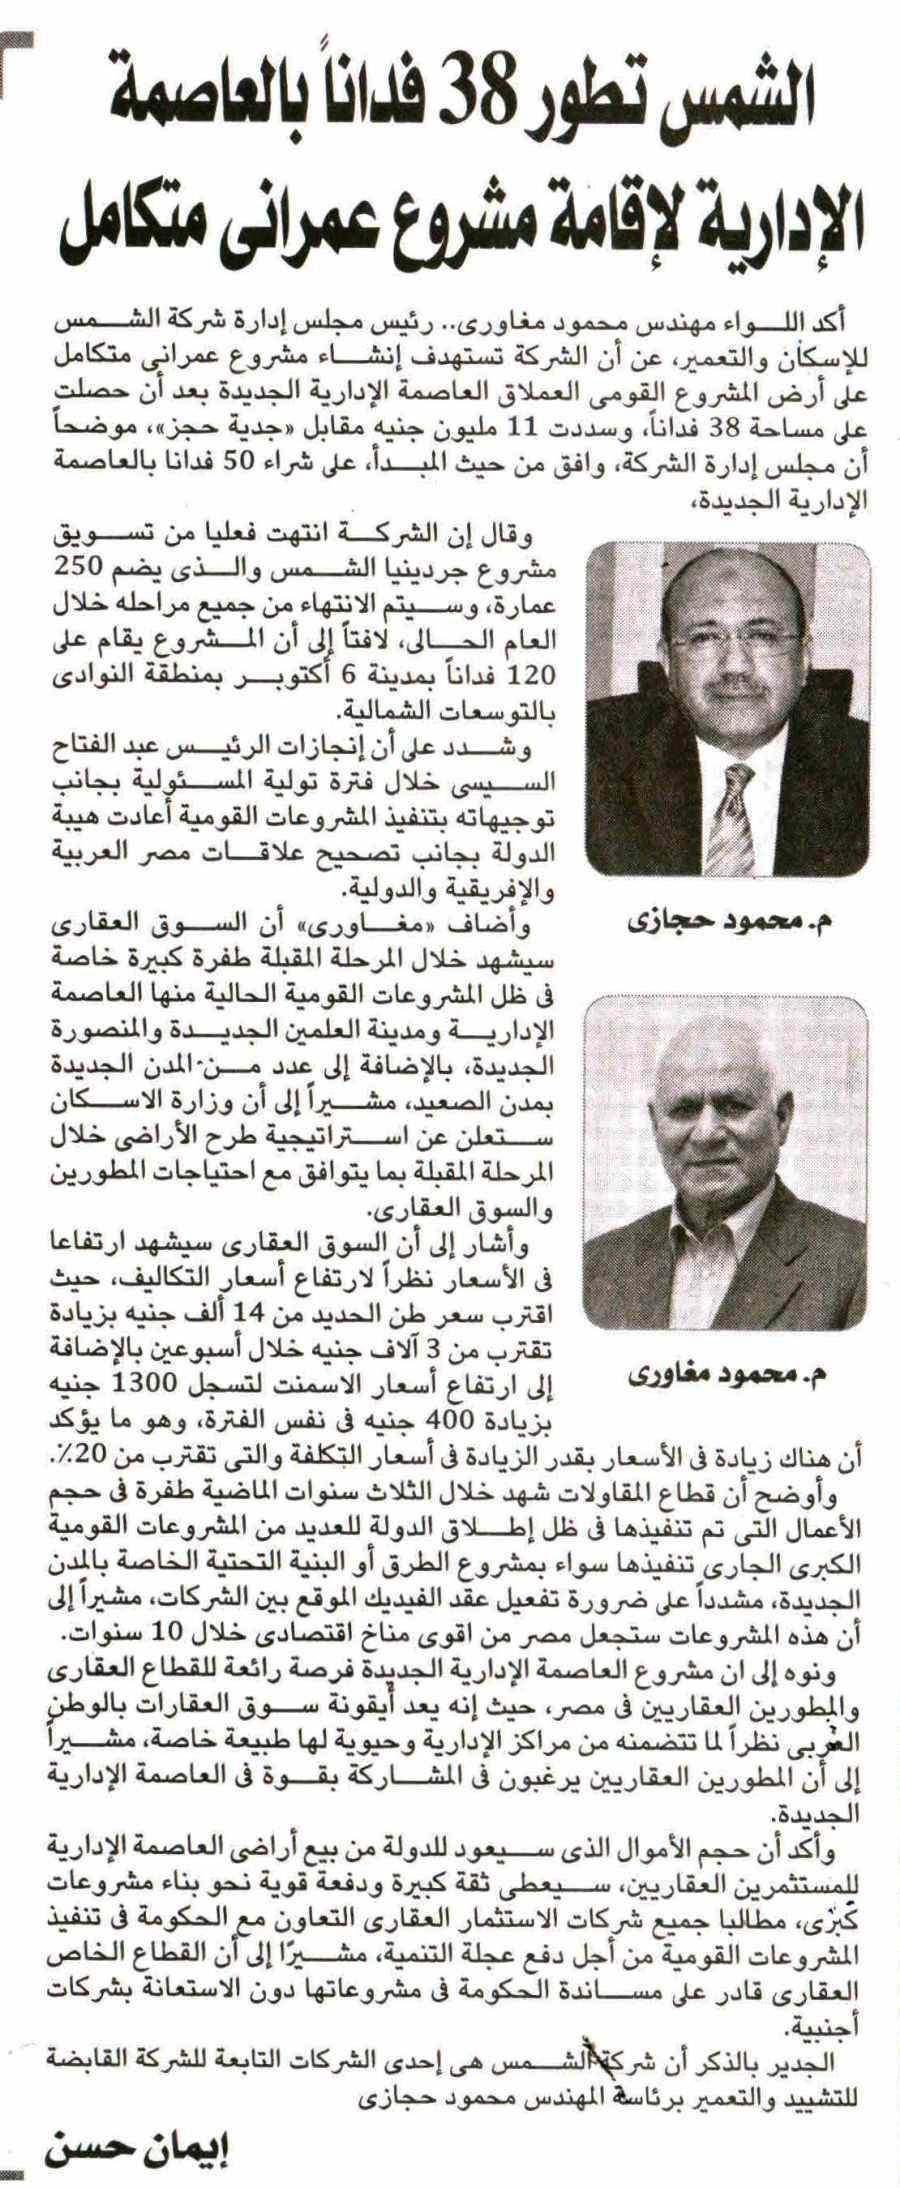 Al Aqaria 18 Mar P.9 .jpg